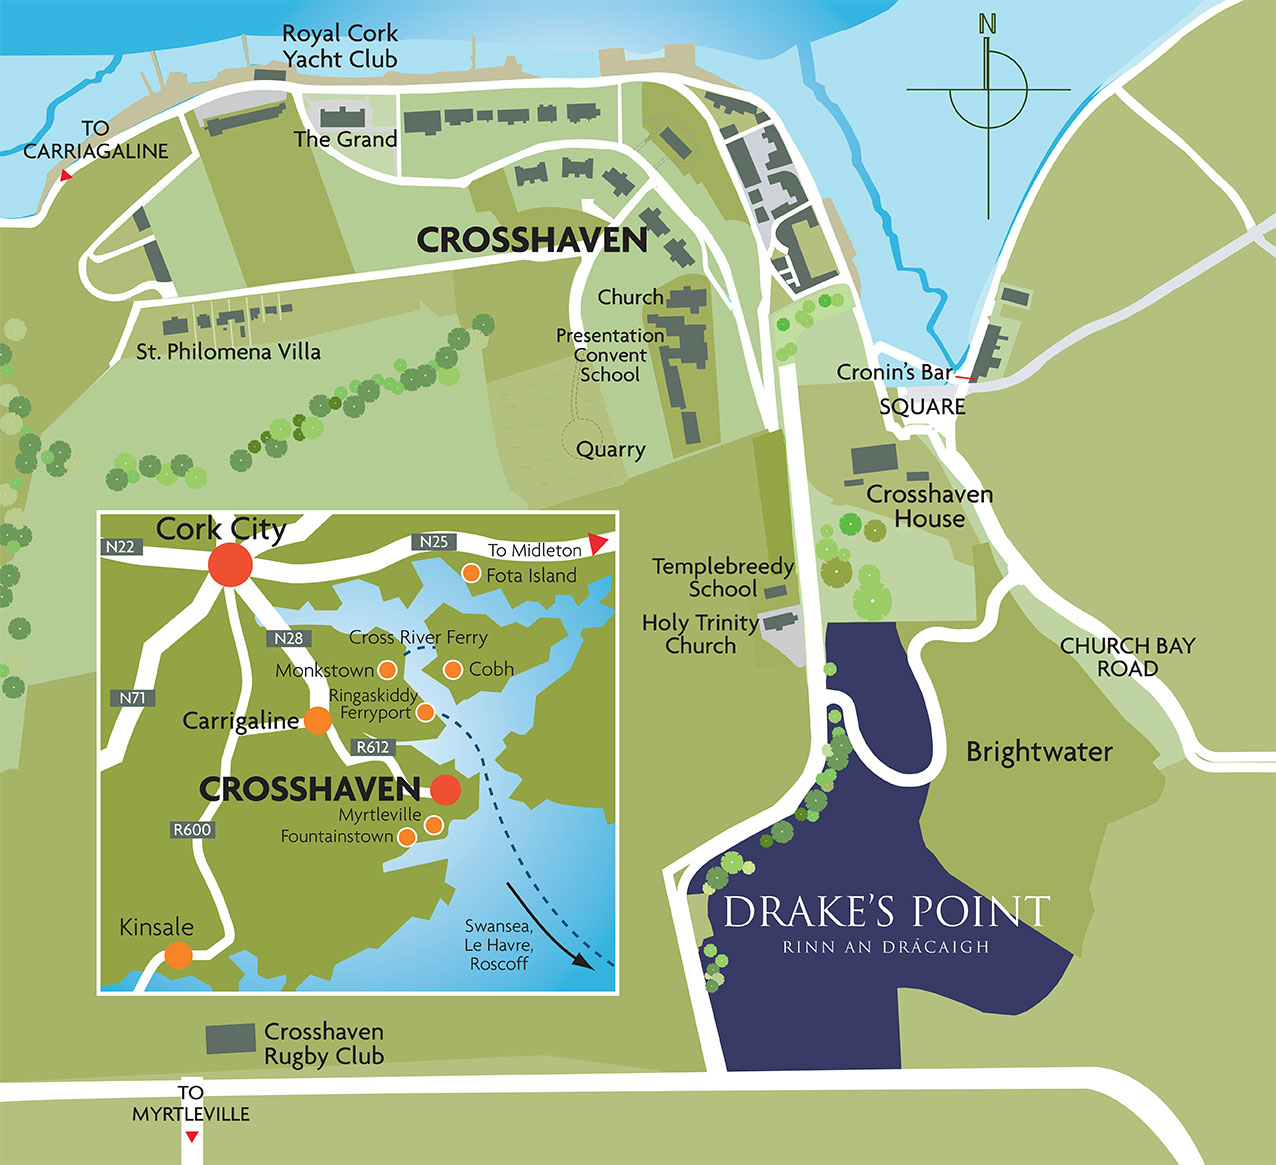 Drakes Point - Drake's Point • Crosshaven on